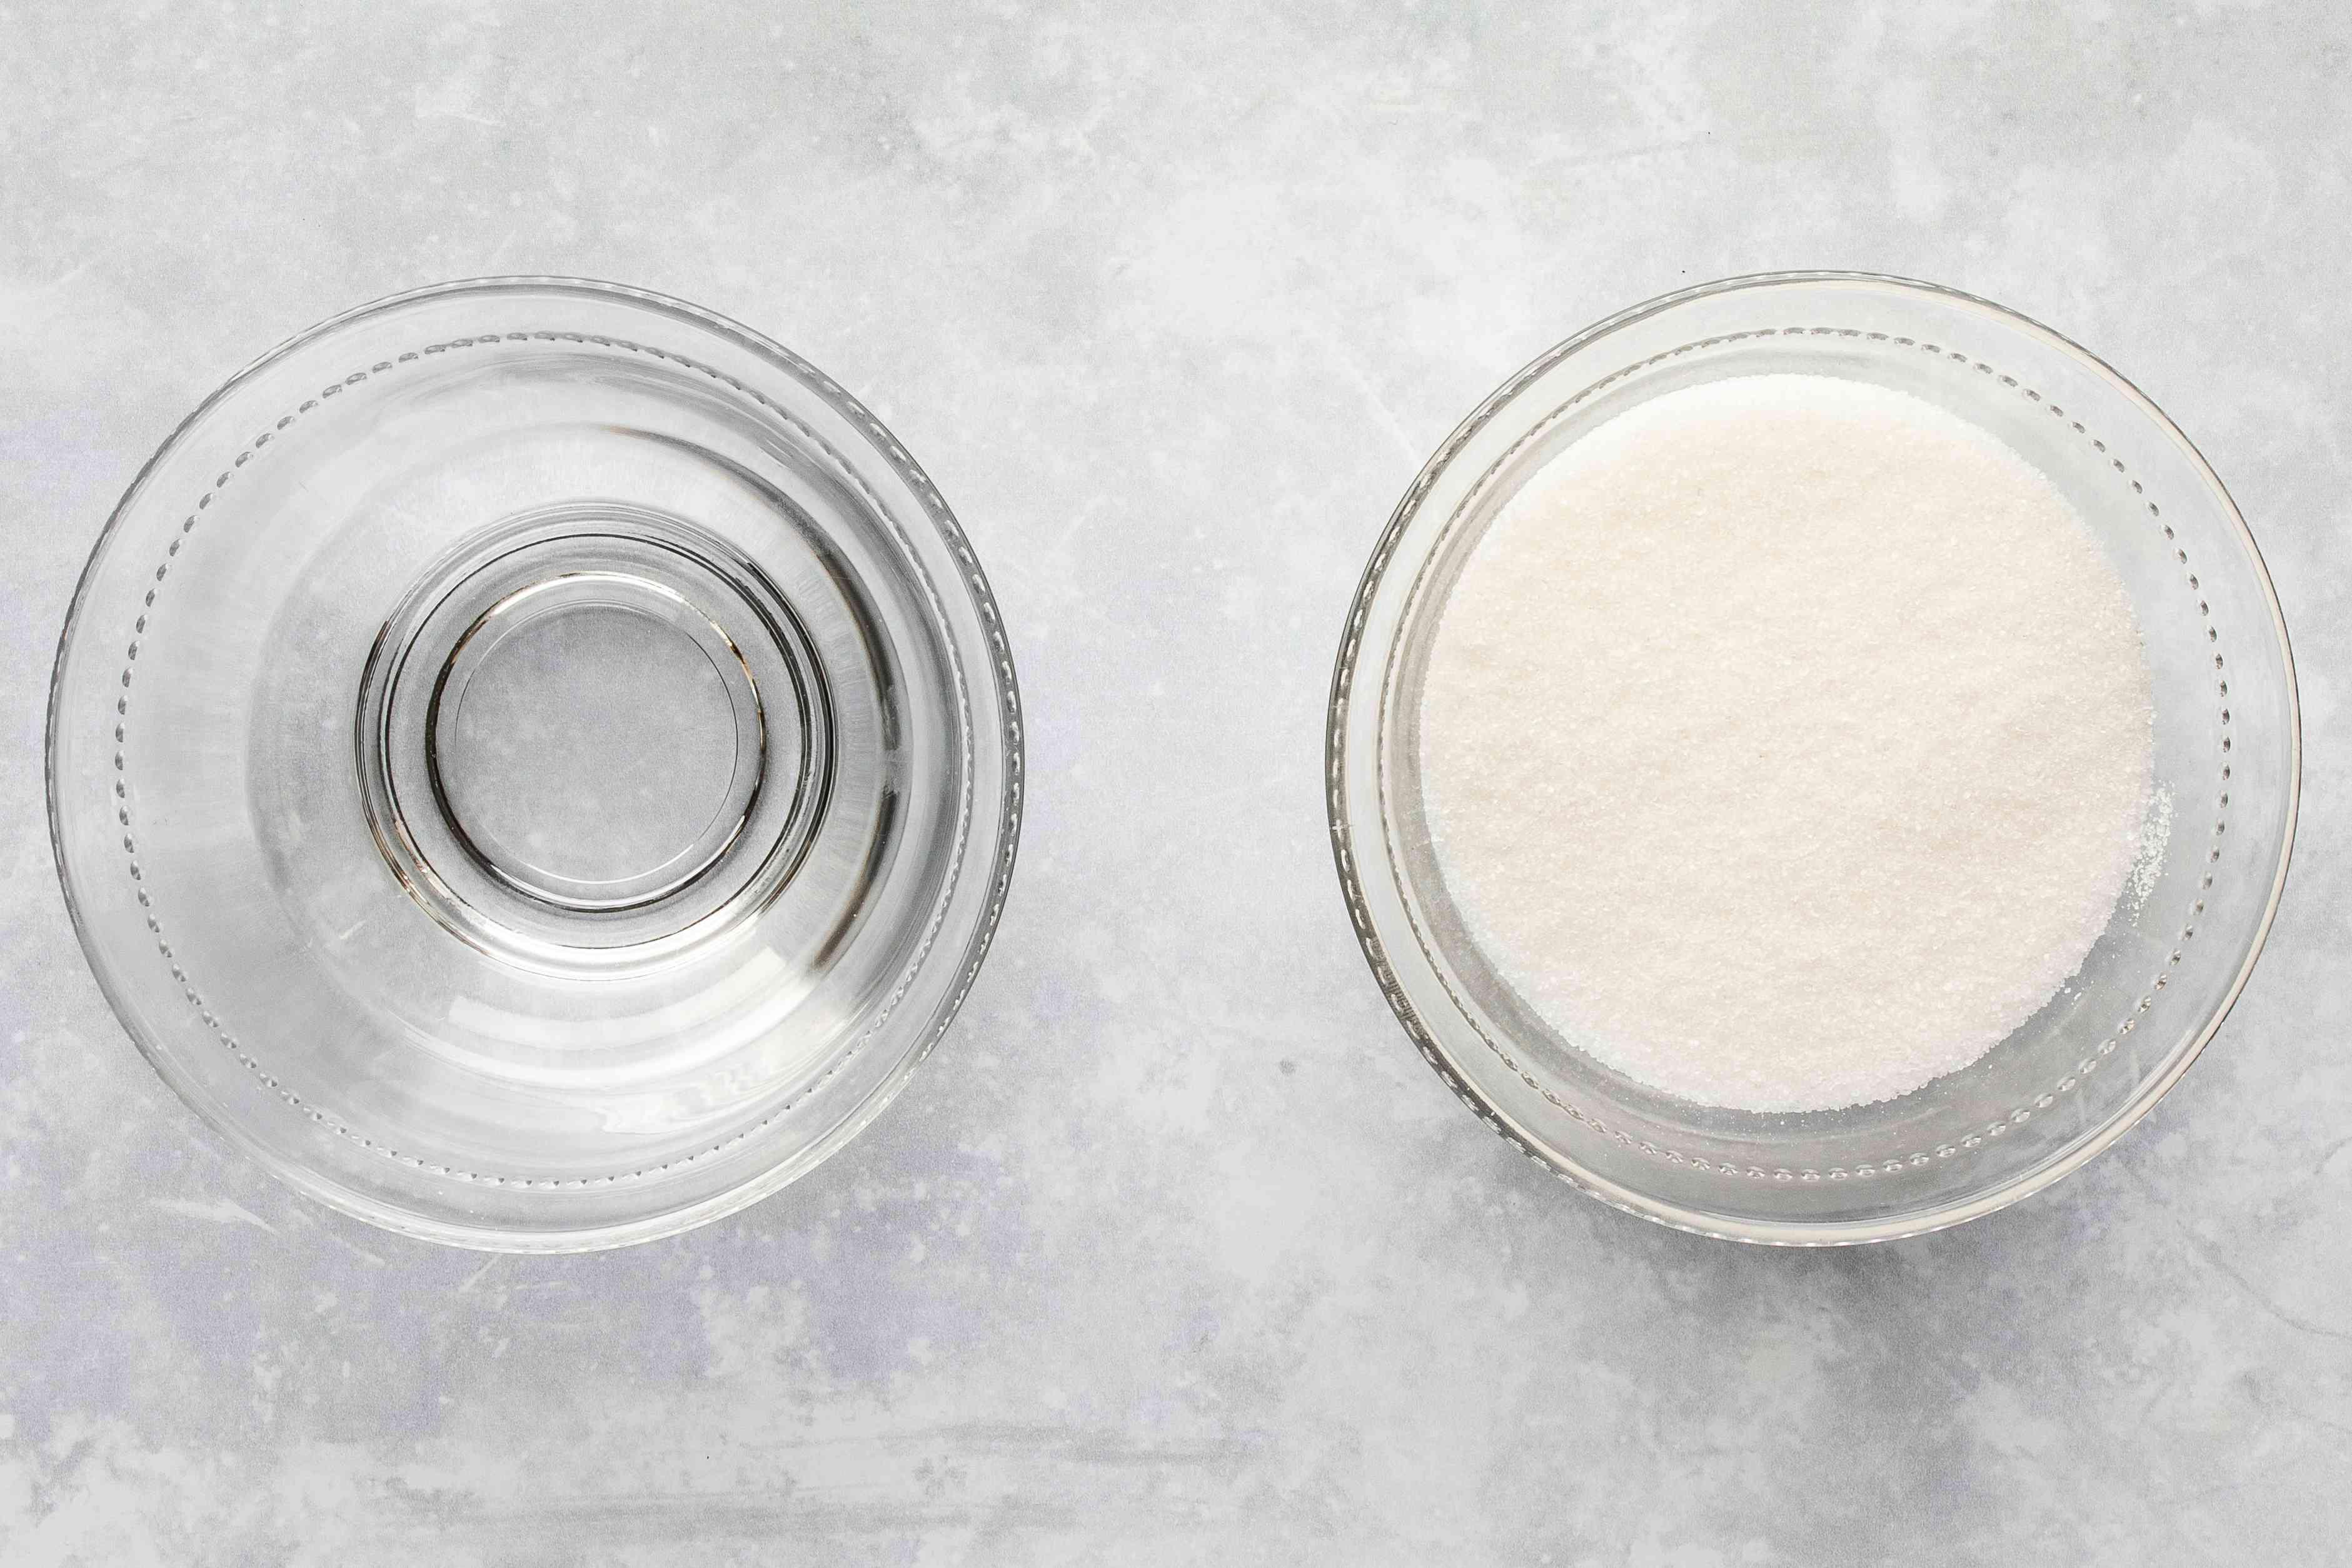 Ingredients for caramel glaze